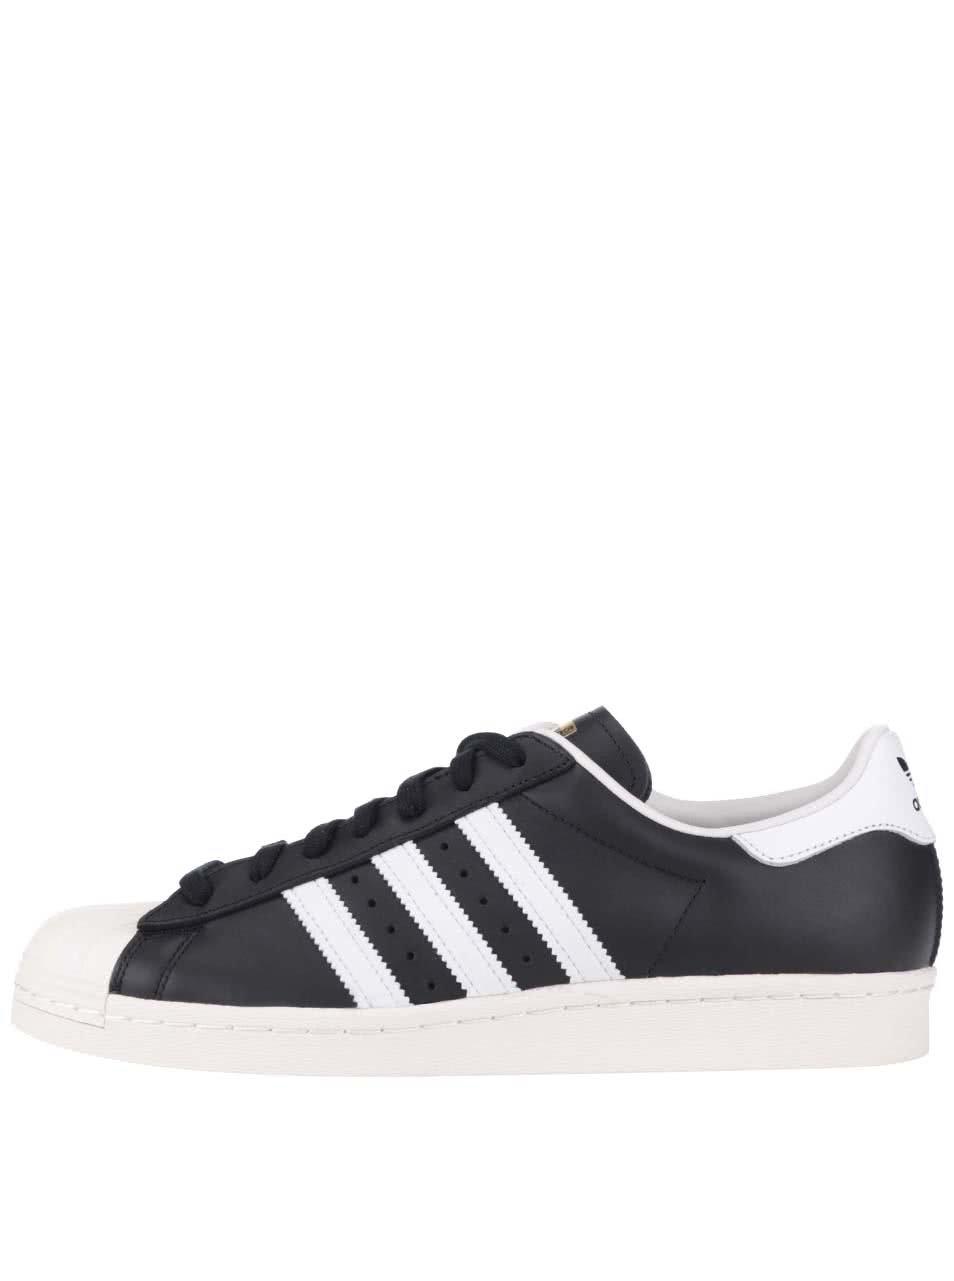 Bielo-čierne pánske kožené tenisky adidas Originals Superstar 80s ... 9b649b22e7